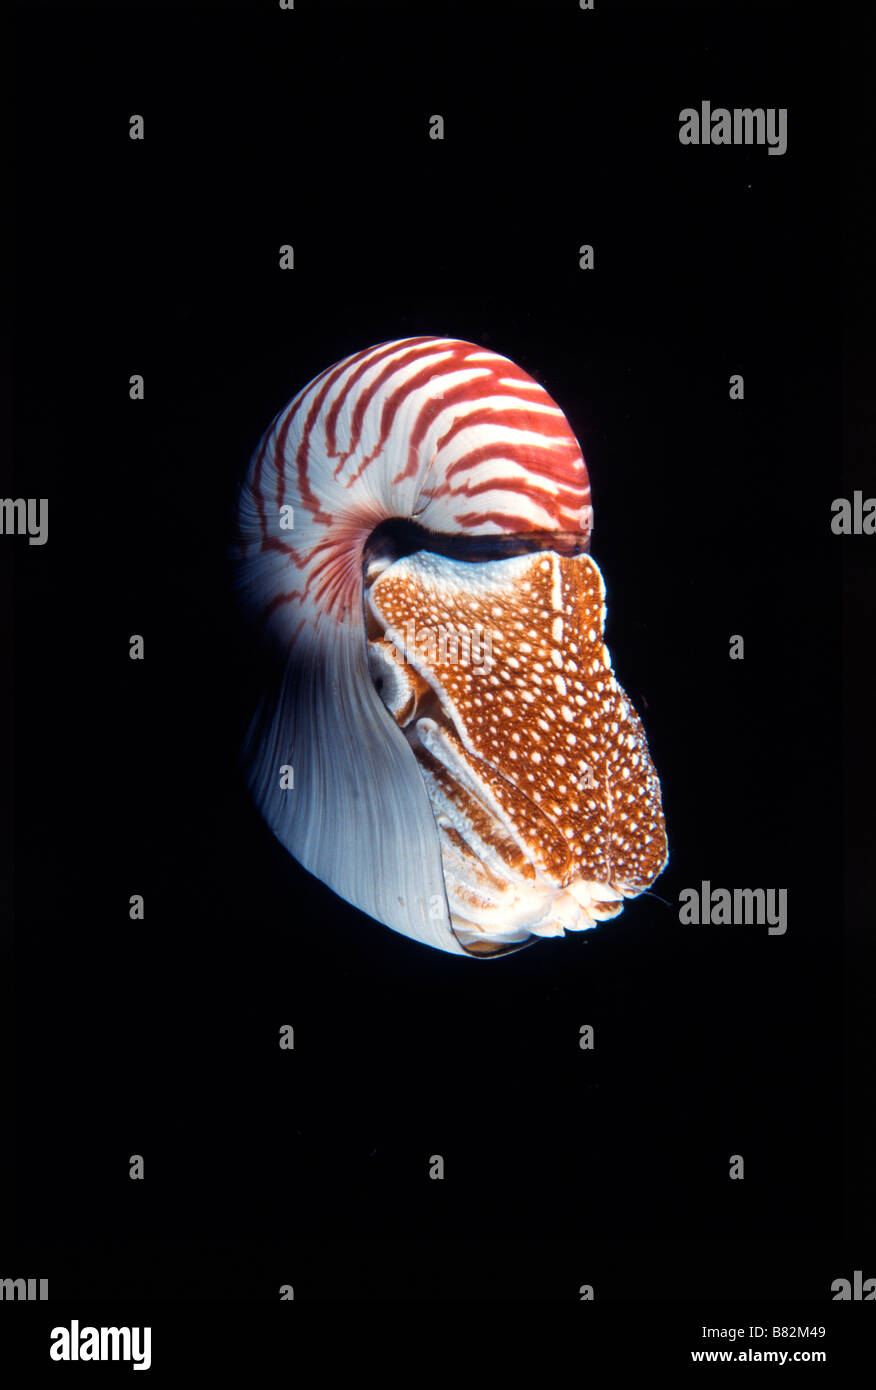 Nautilus Pompilus, underwater, at night, dive night, mollusk, Papua New Guinea, night dive, prehistoric, shell - Stock Image